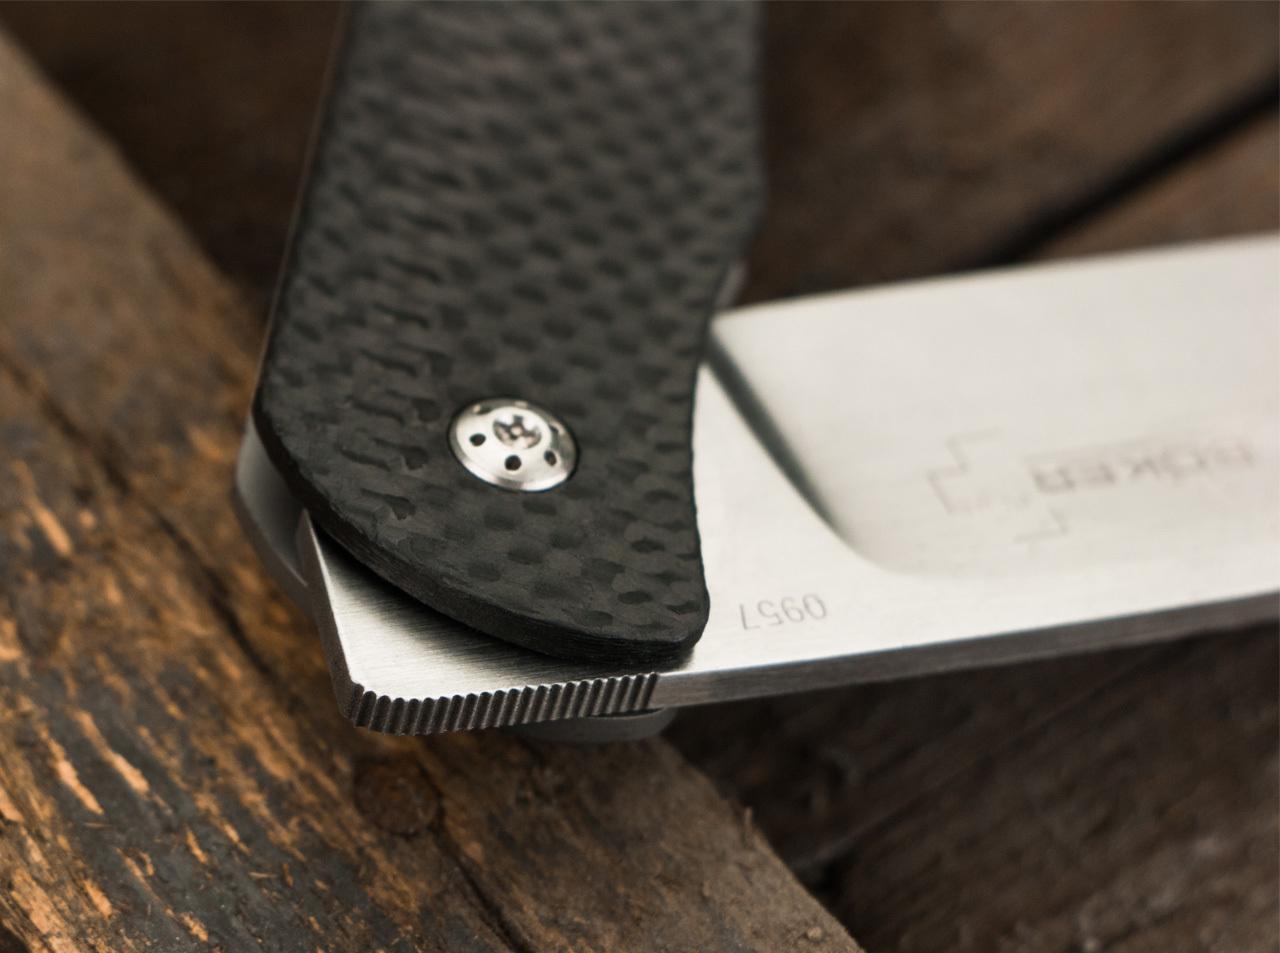 Фото 9 - Нож складной Exskelibur I Carbon Fiber, Titanium Frame Lock, сталь CPM-S35VN Satin Plain, рукоять карбон/титан, Boker Plus 01BO135